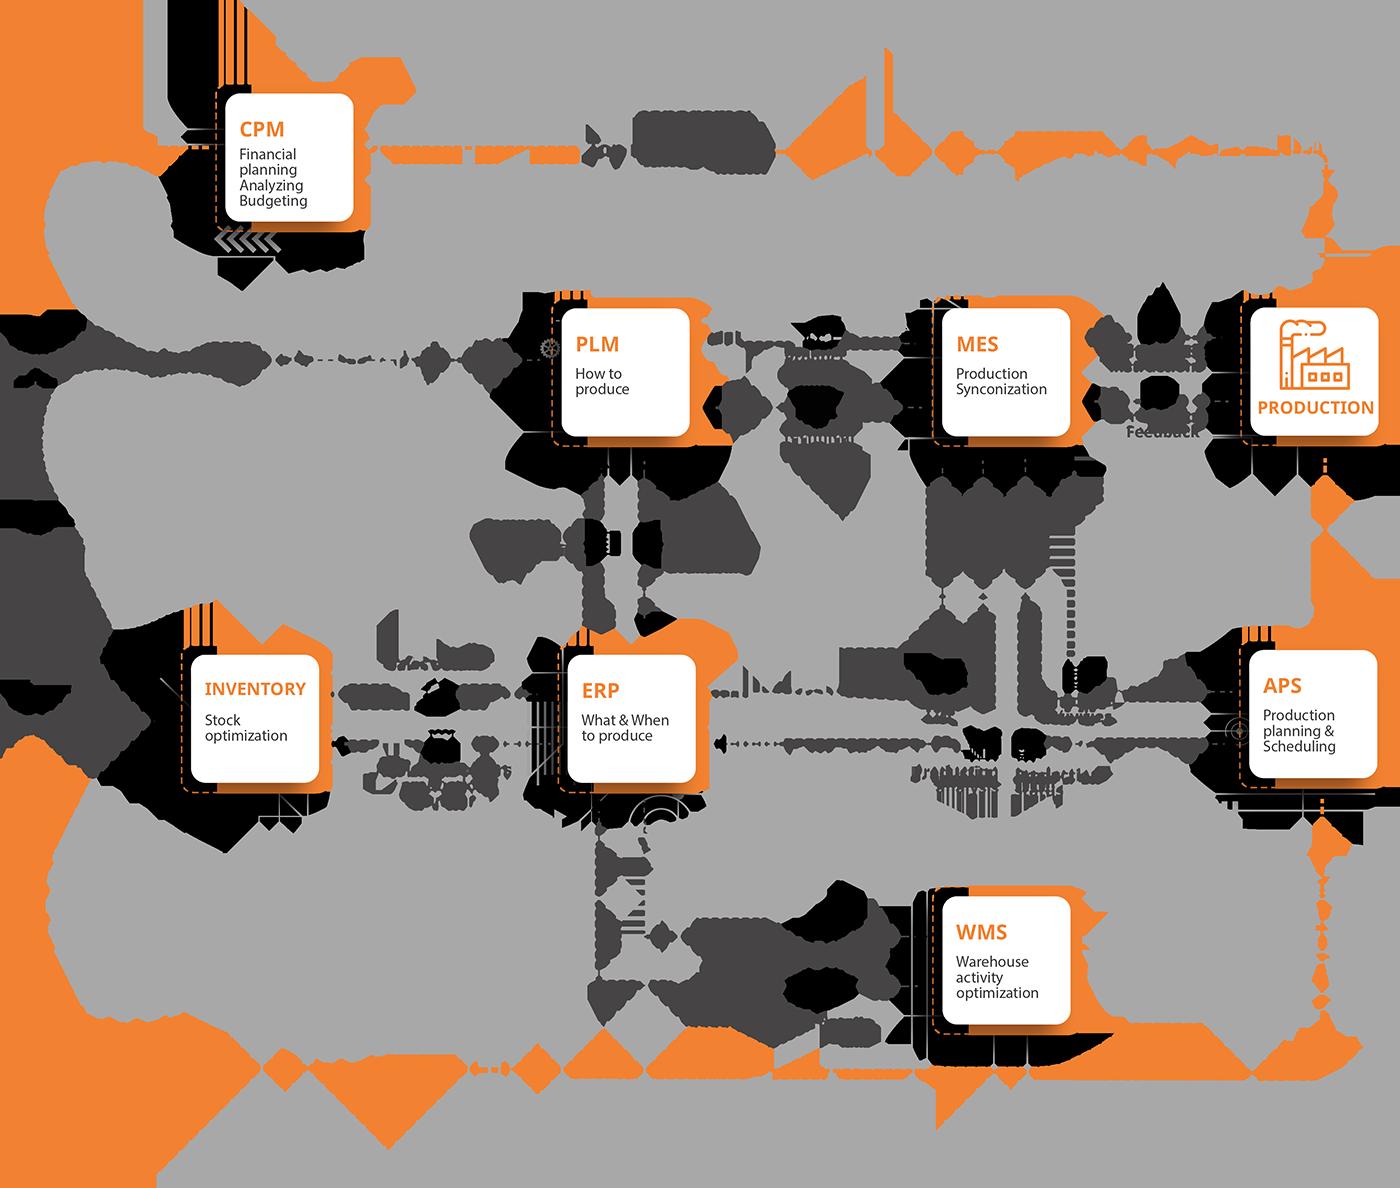 [EN]schema-toate-solutiile-erp-crm-aps-mes-ecommerce-wms-productie-v3.1